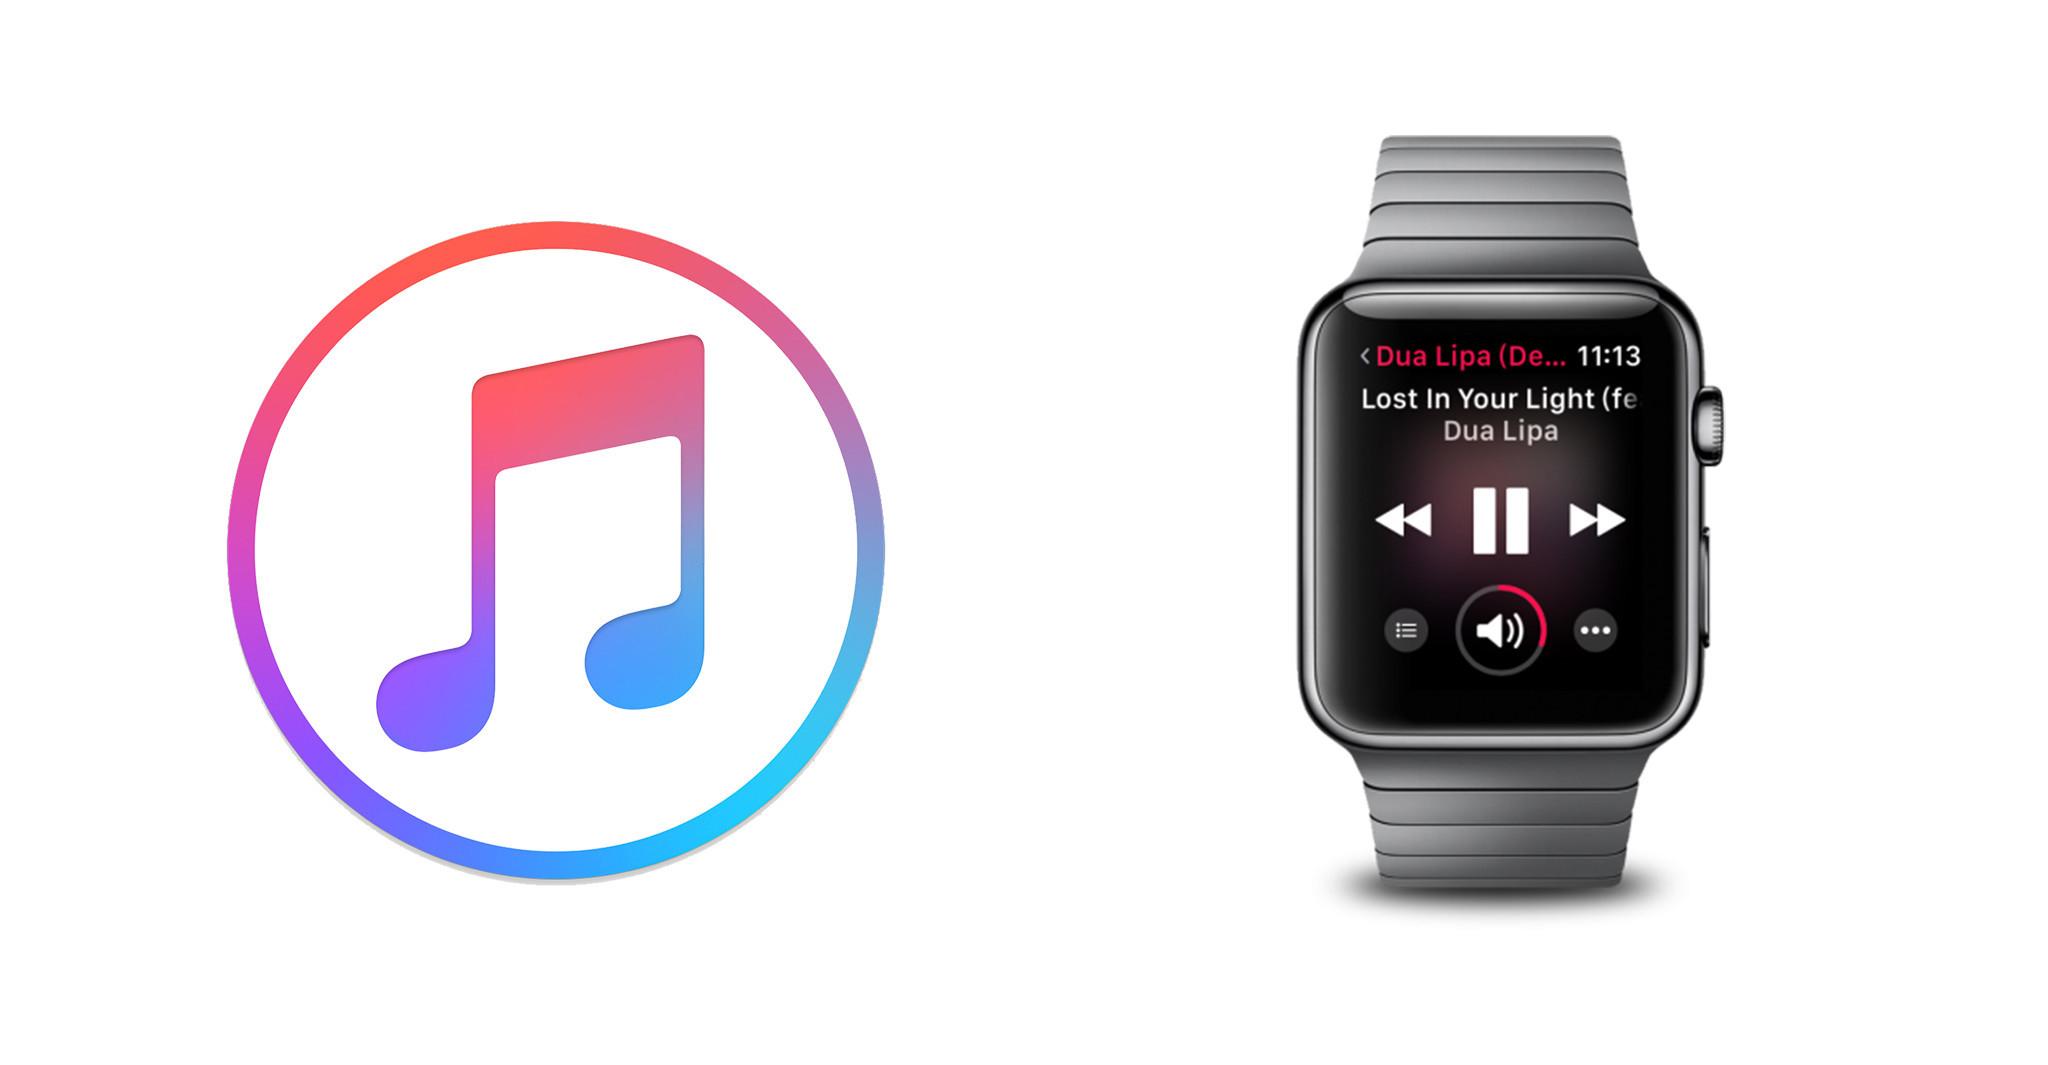 Apple Watch, Apple Watch Series 3, , Apple, Screen Protectors, Wearable technology, , Computer Monitors, Retina Display, Internet, apple watch internet, product, watch, product, brand, font, watch strap, watch accessory, iTunes